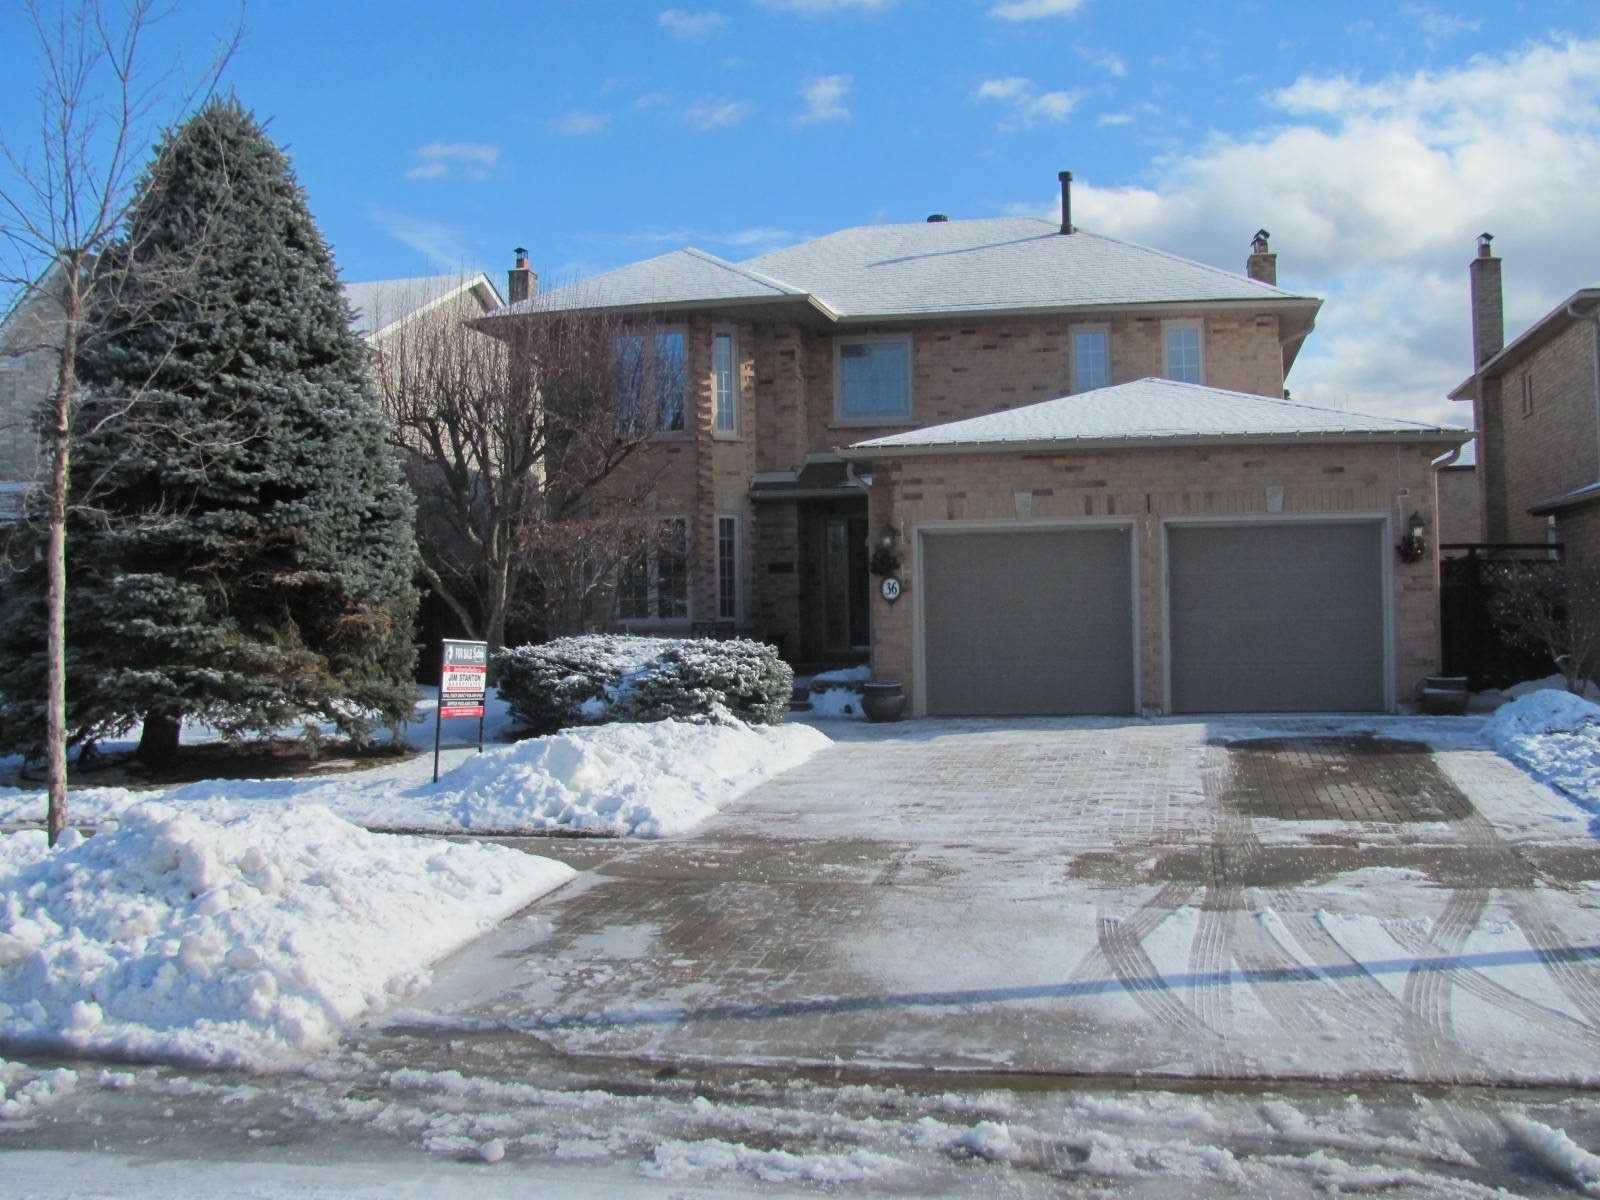 Main Photo: 36 Bentonwood Crescent in Whitby: Pringle Creek House (2-Storey) for sale : MLS®# E4325619